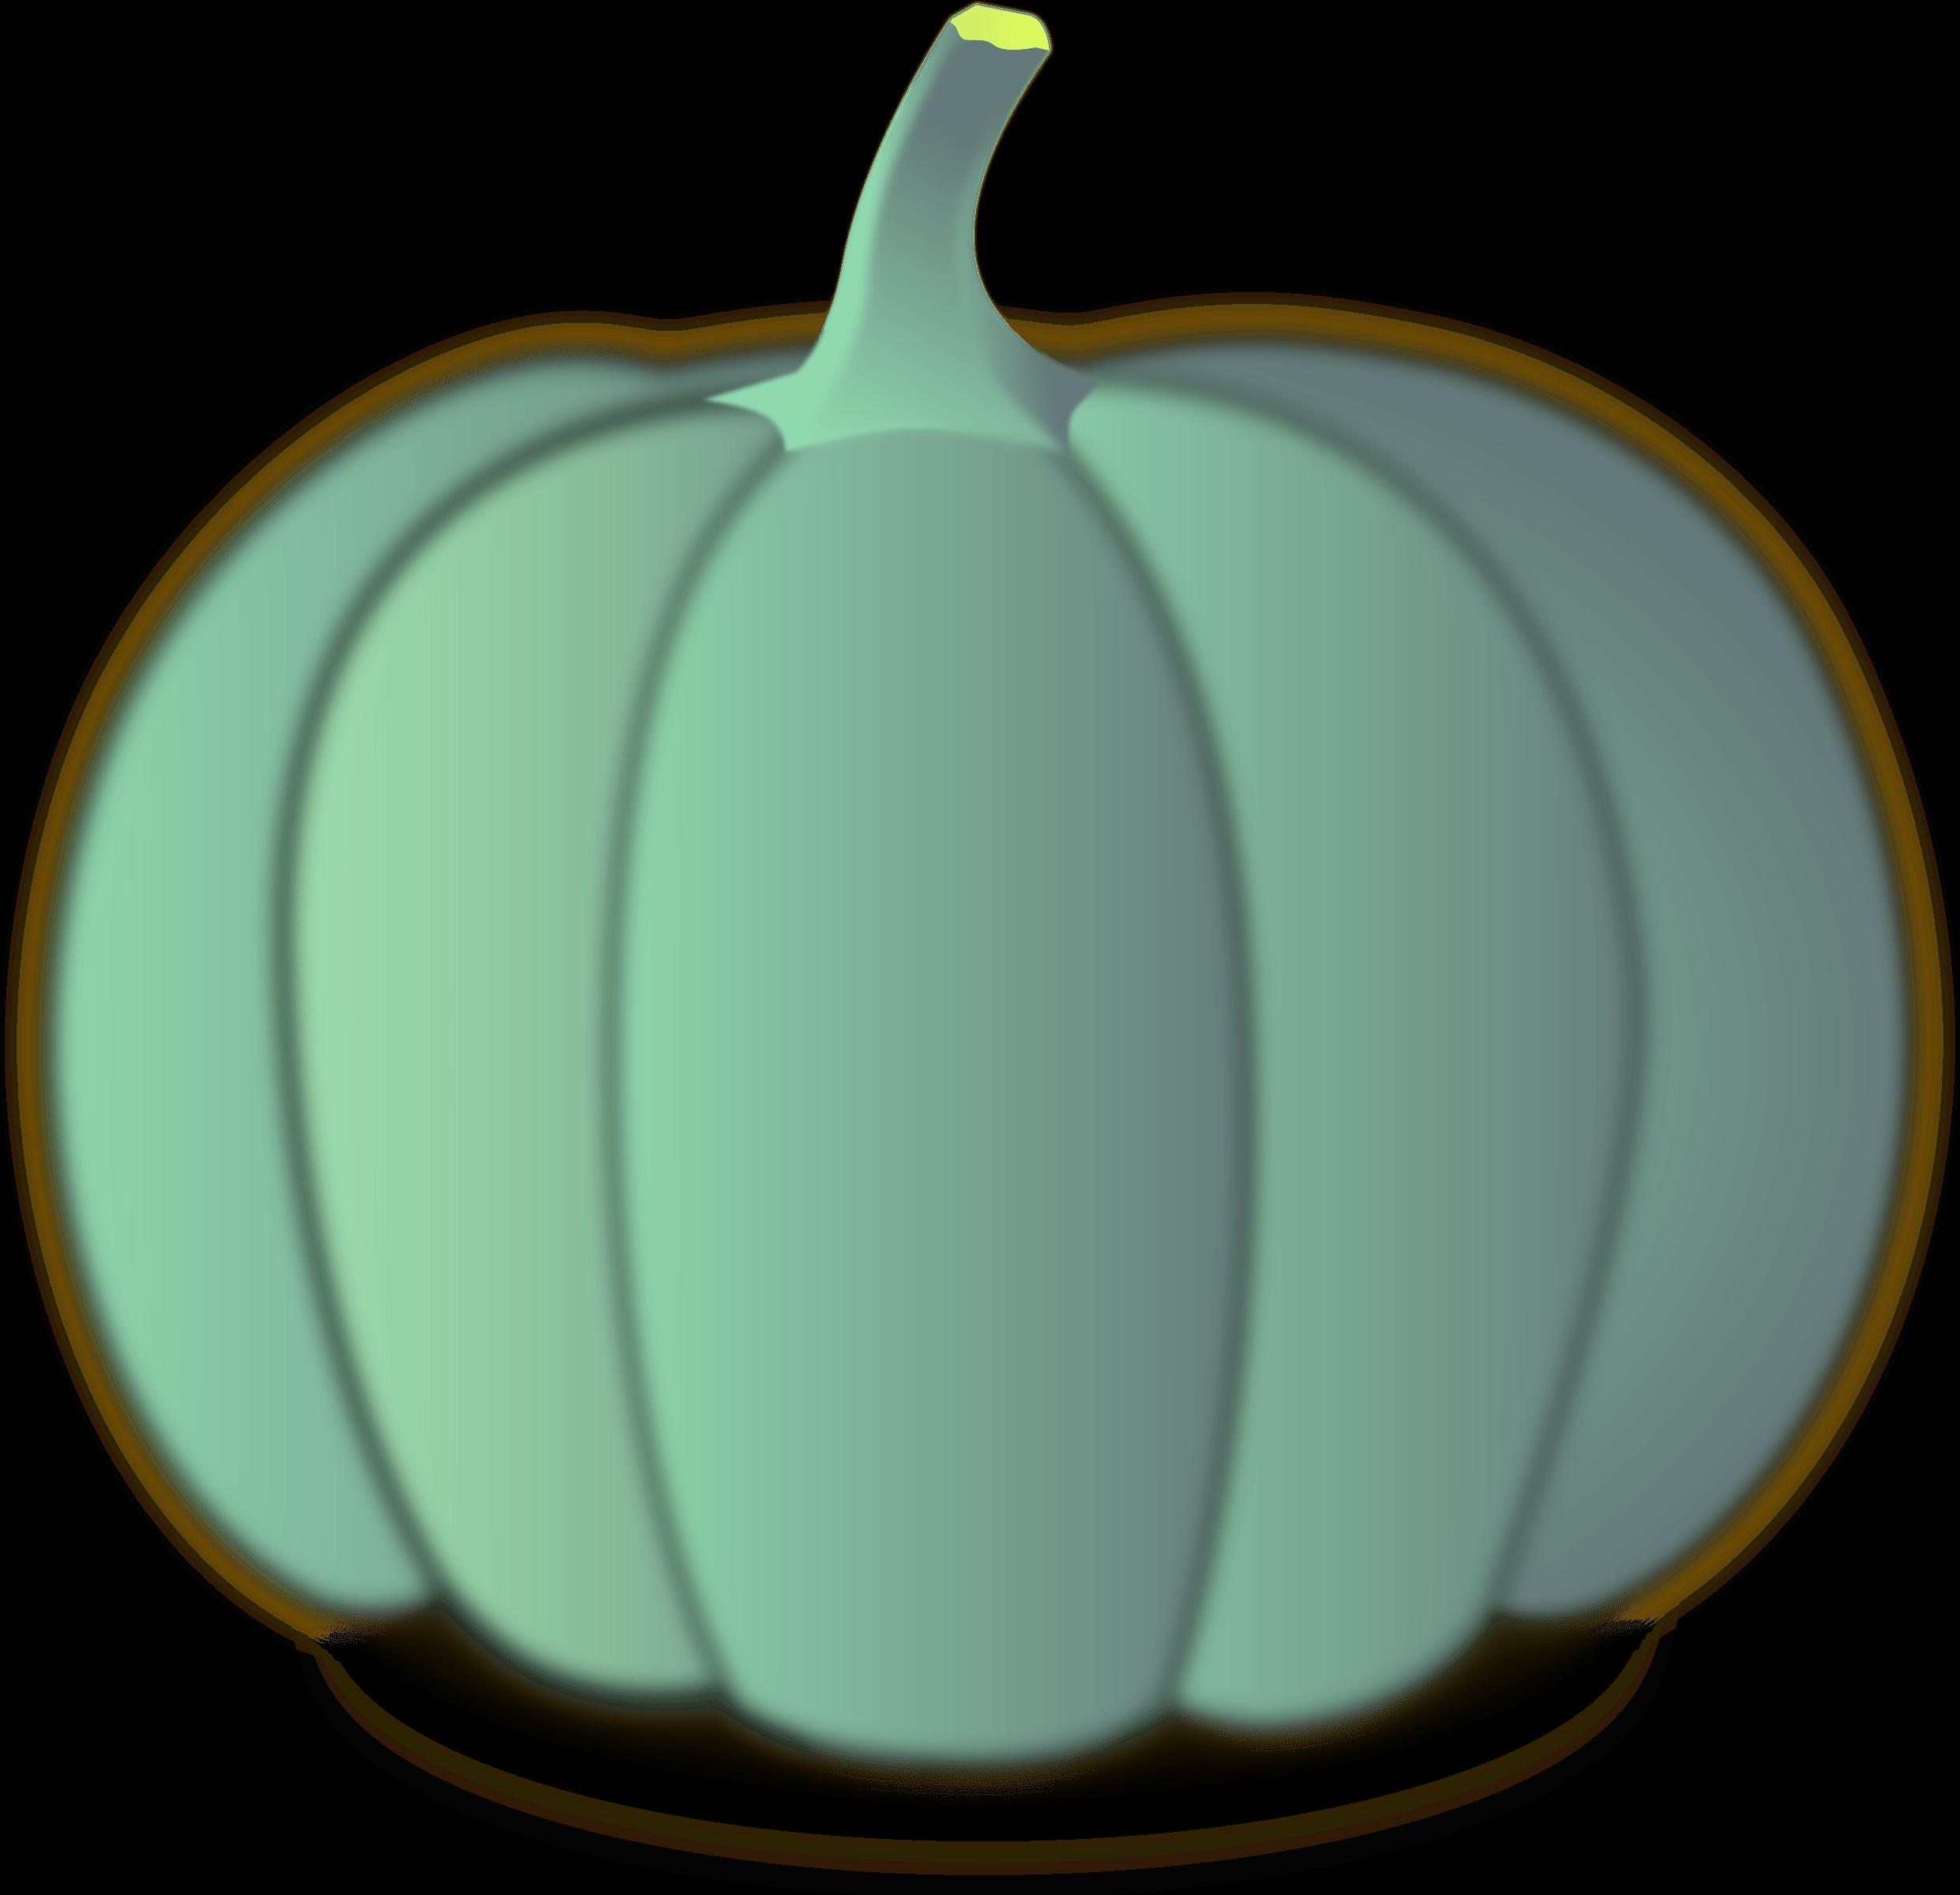 Pumpkin clipart pumkin. Green cliparts zone